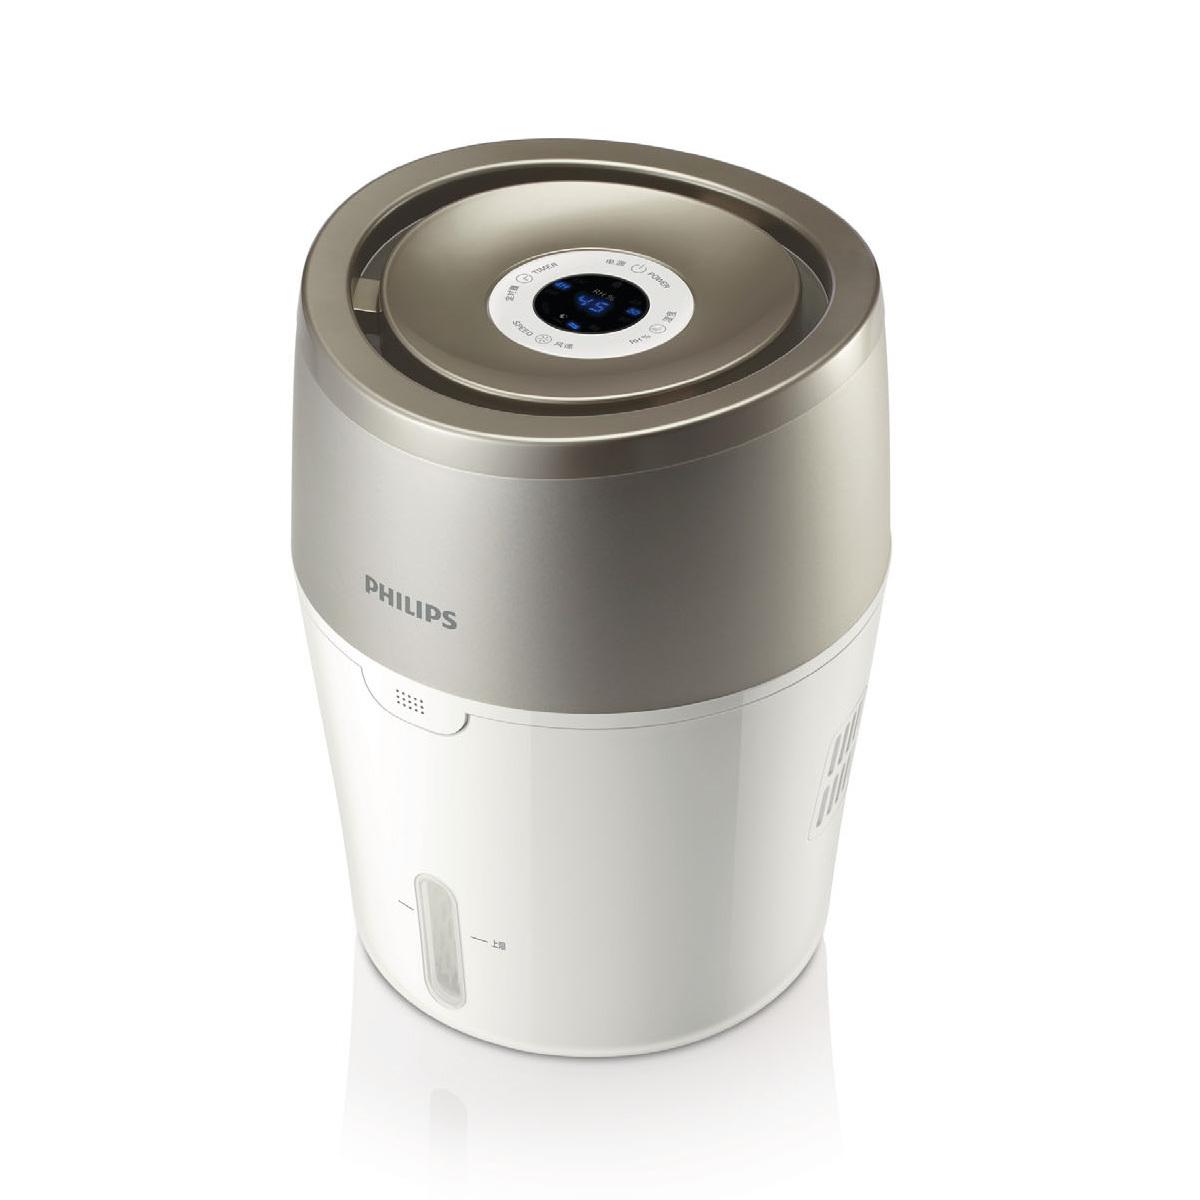 Philips/飞利浦 HU4803/00 加湿器怎么样,评测